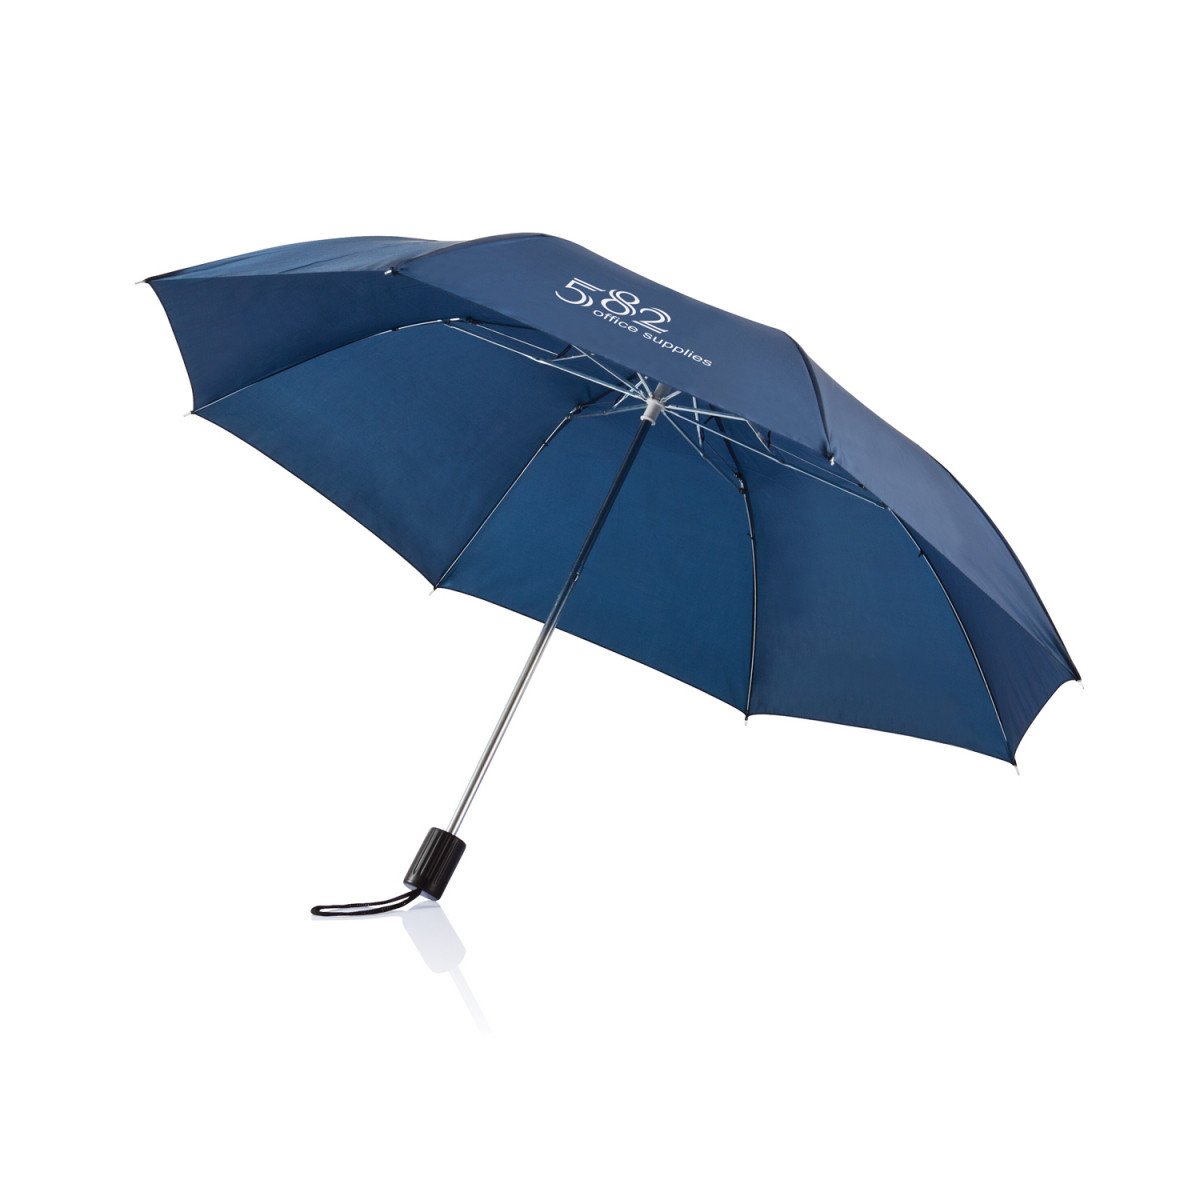 Складной зонт Deluxe 20,темно-синий